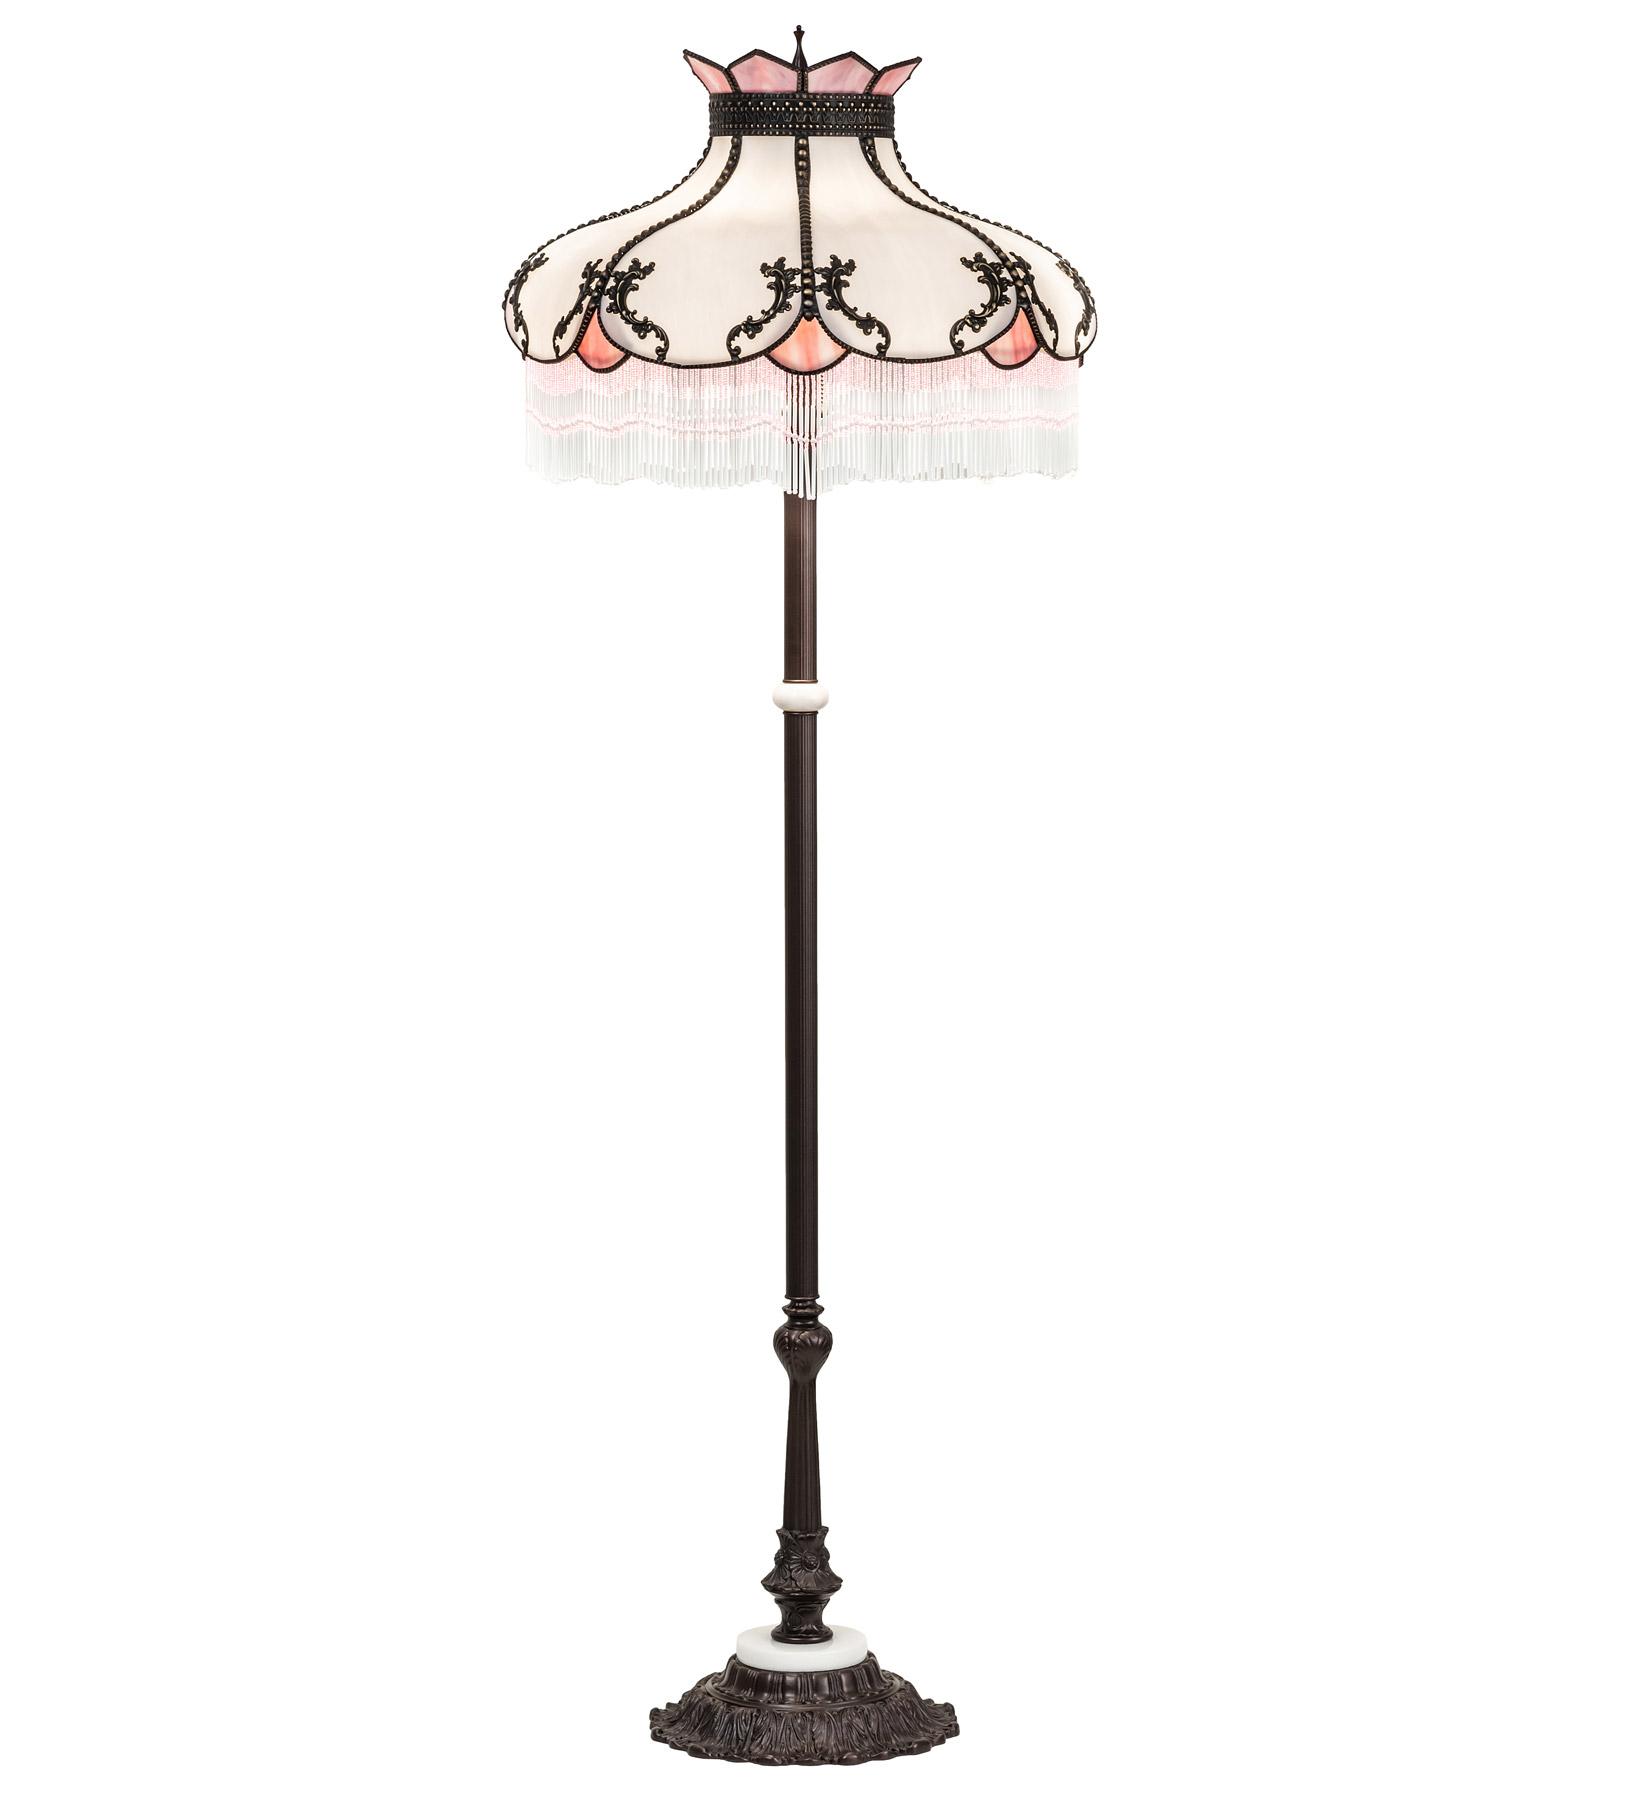 Meyda 31314 Nostalgia Classics Elizabeth Floor Lamp